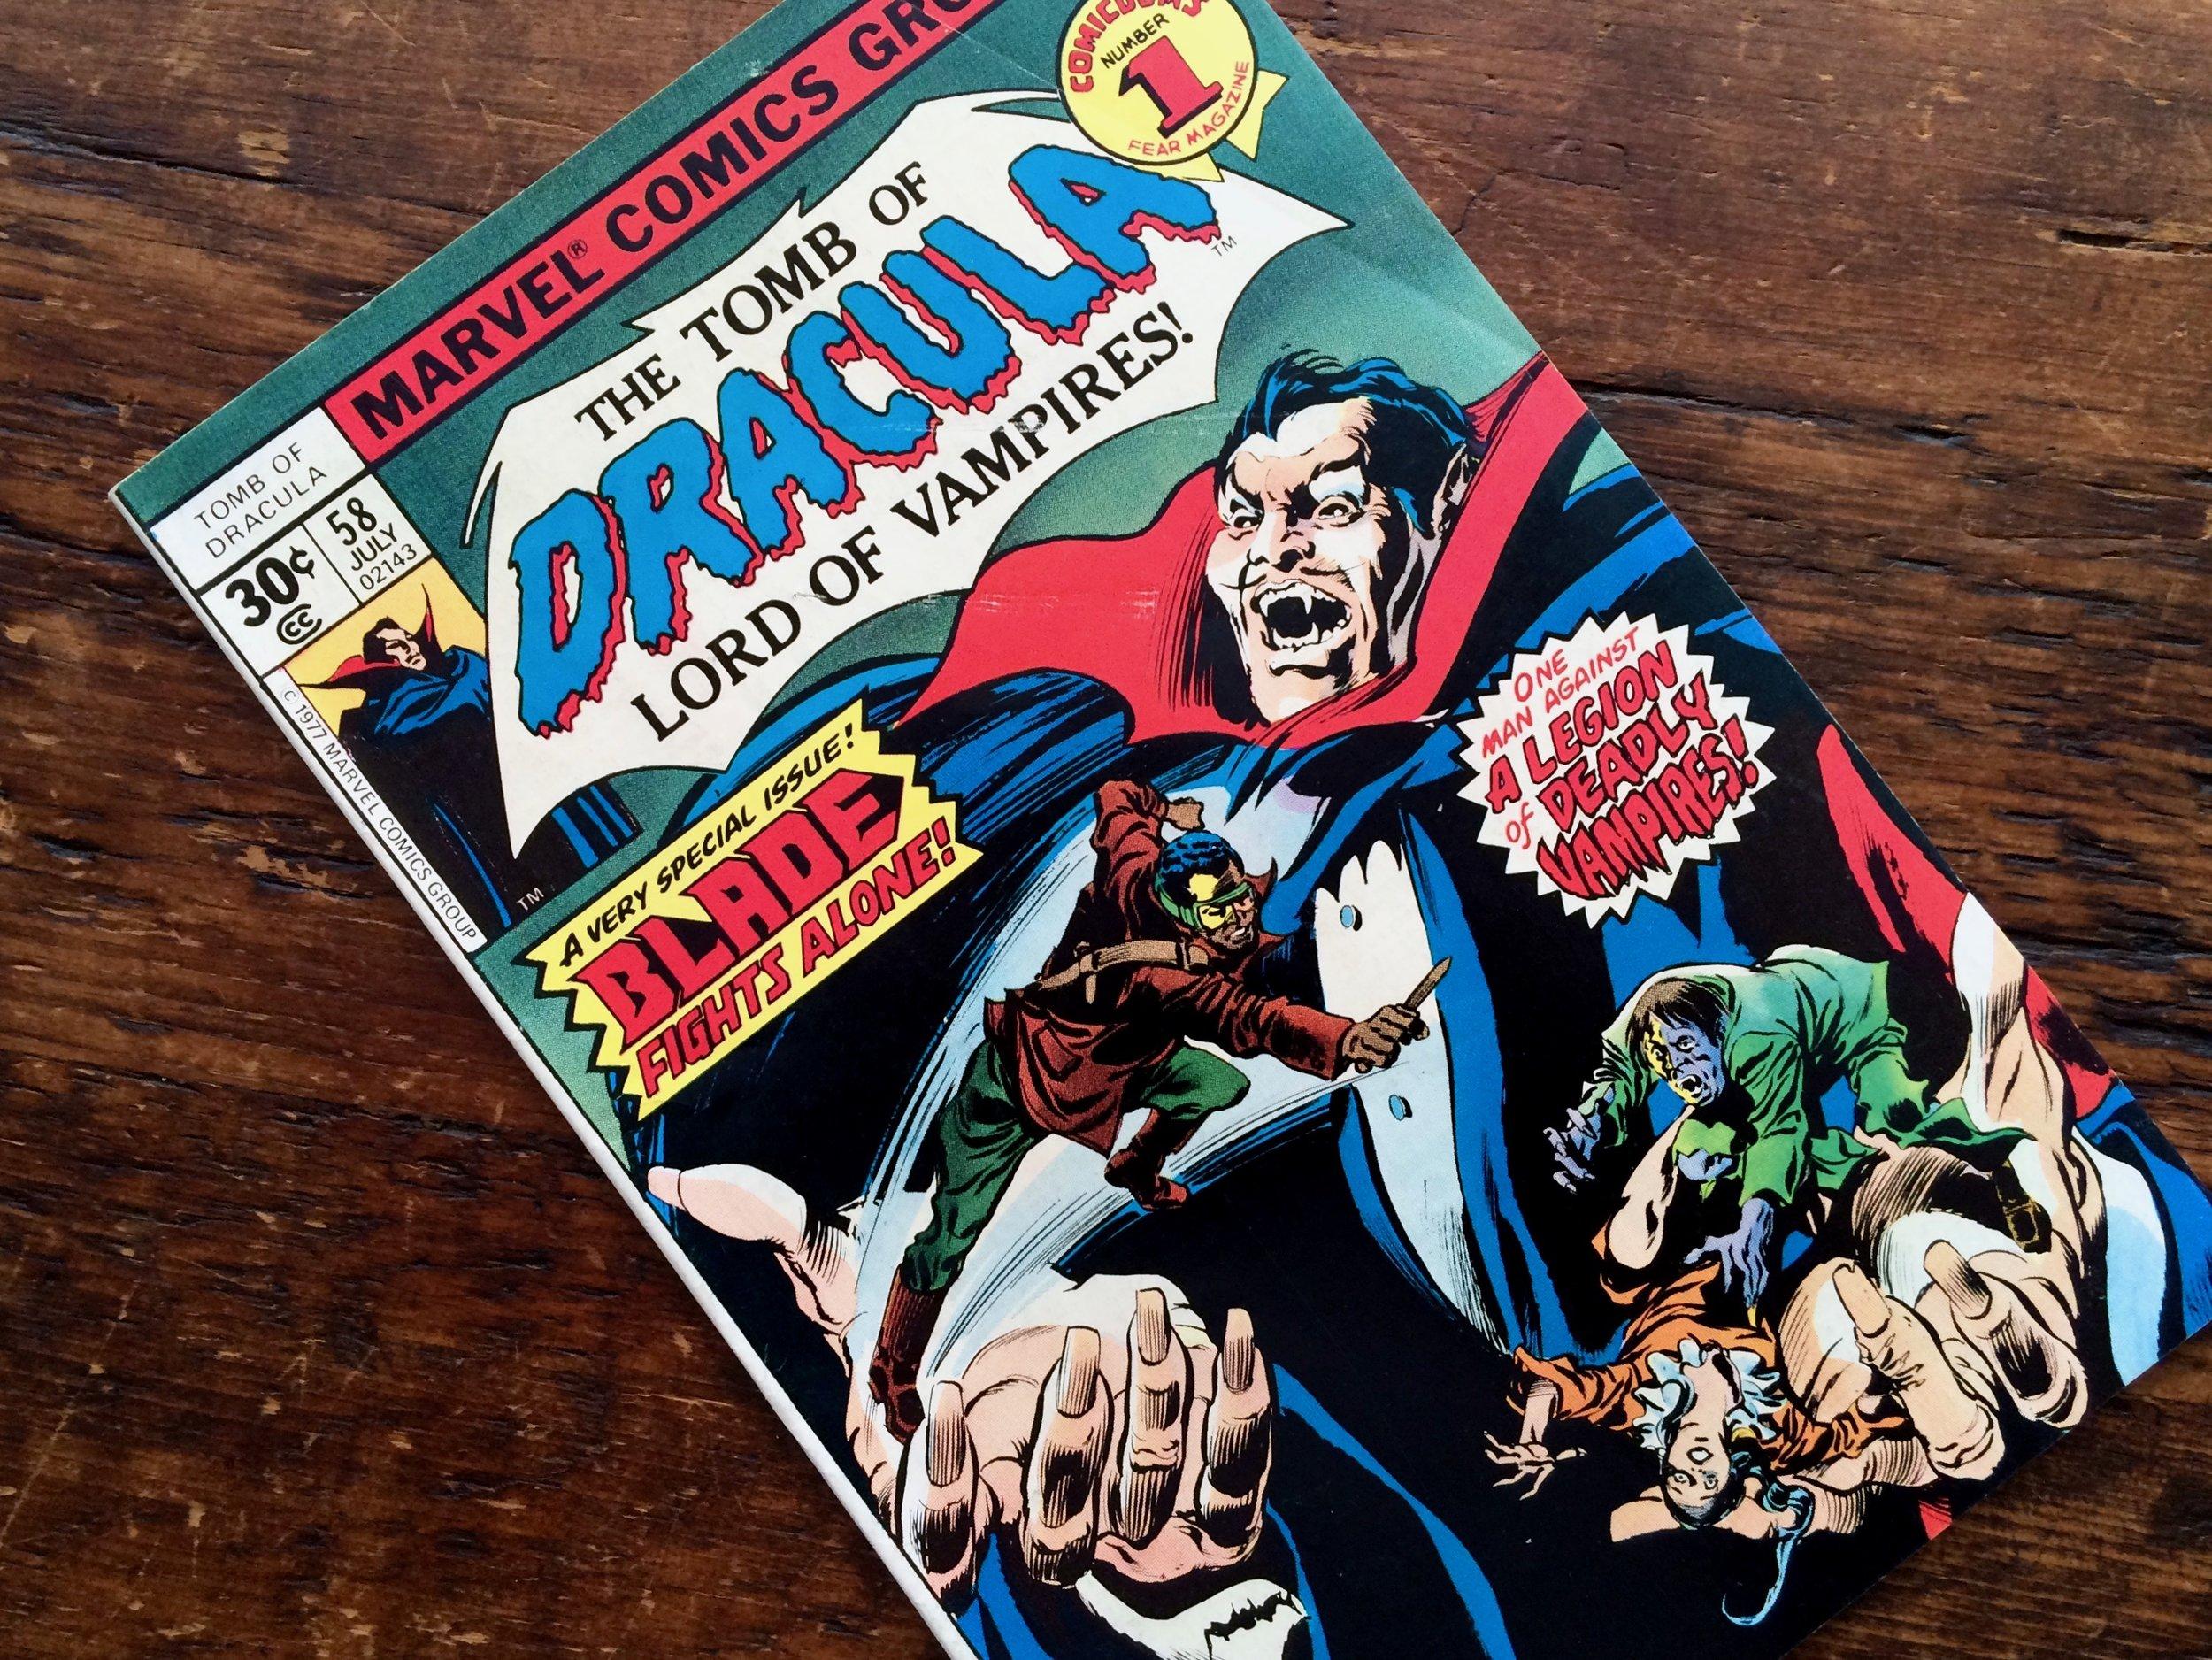 Tomb of Dracula #58 Blade